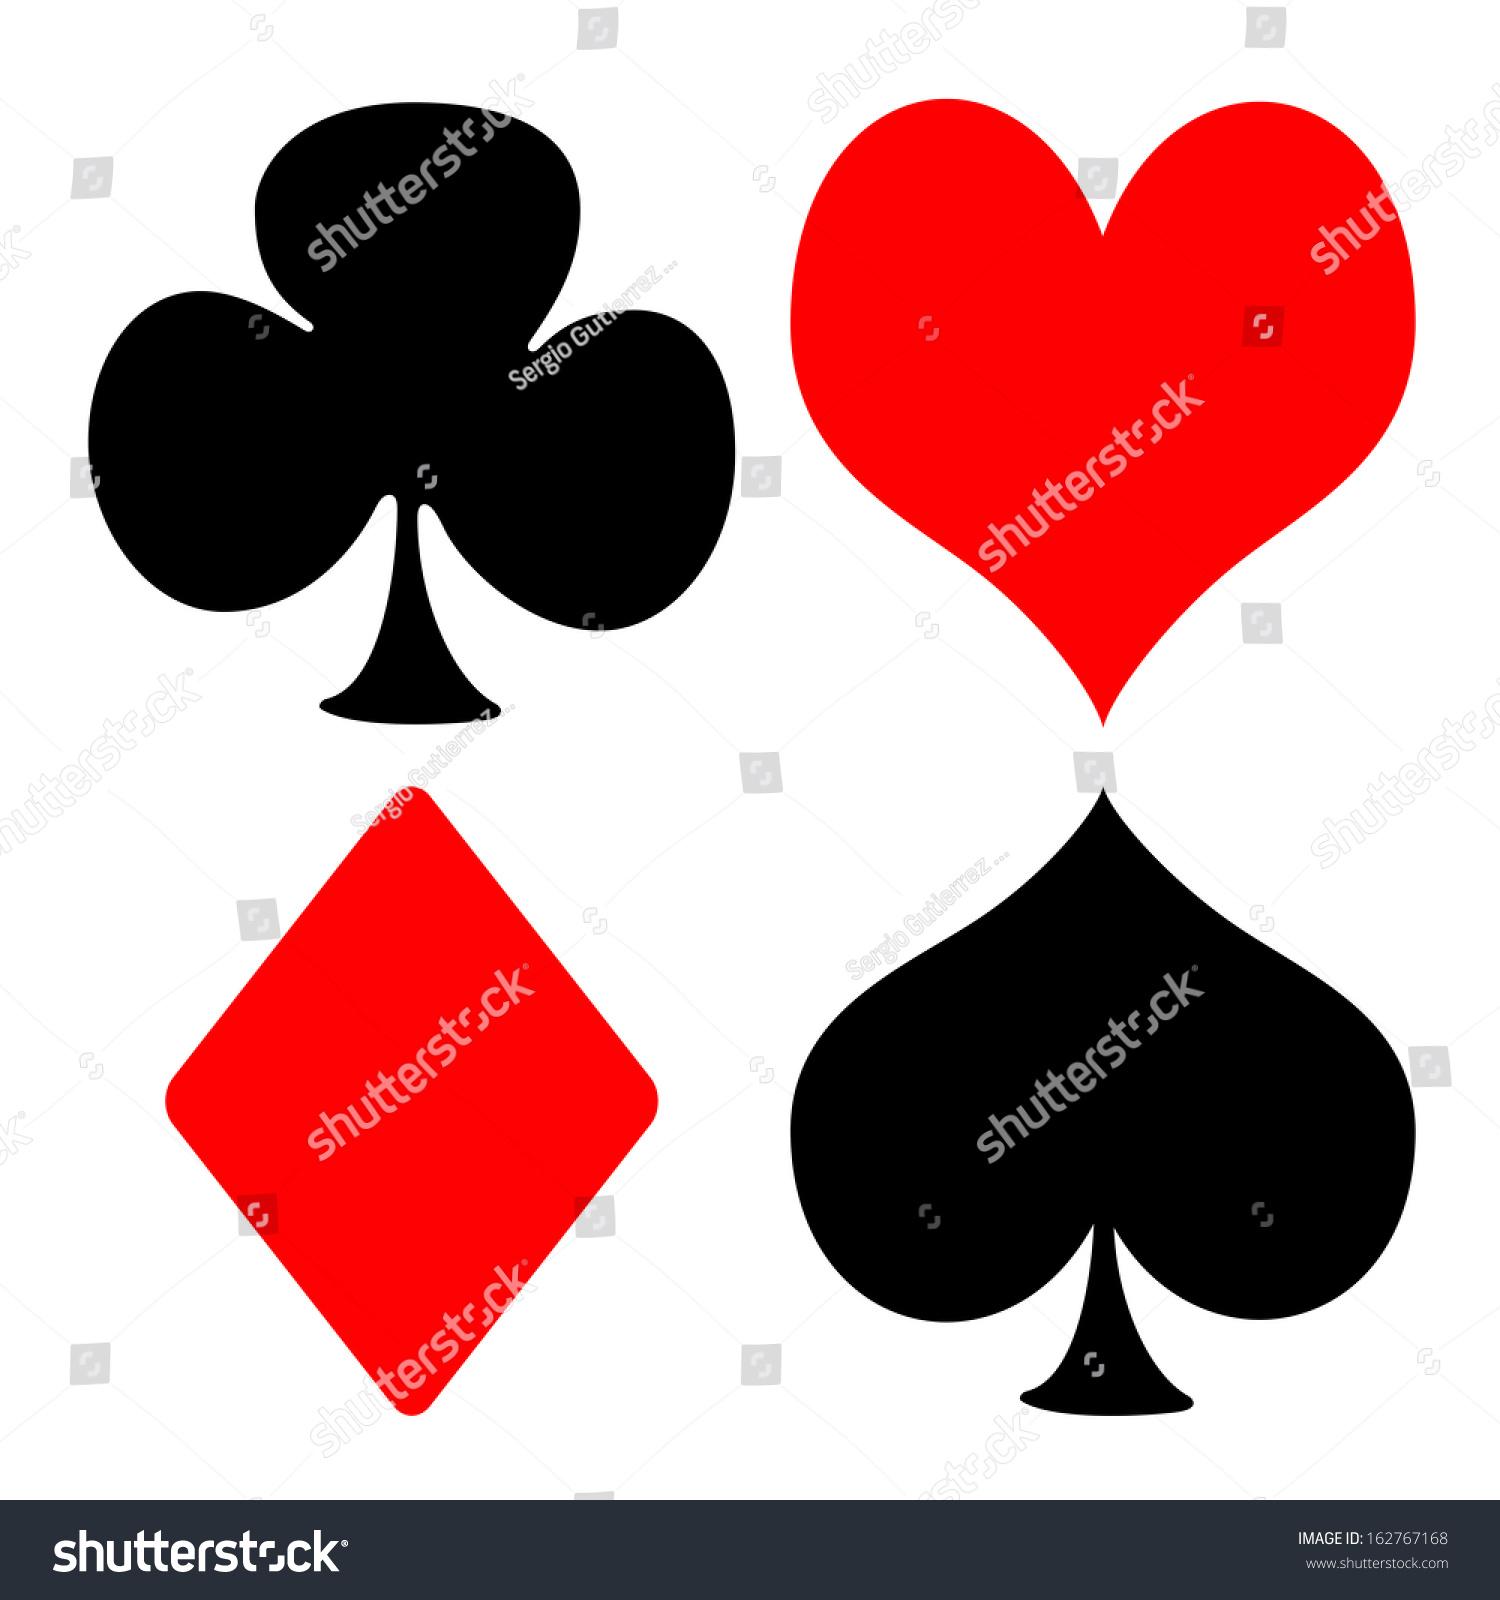 Playing Cards Symbols Stock Illustration 162767168 Shutterstock